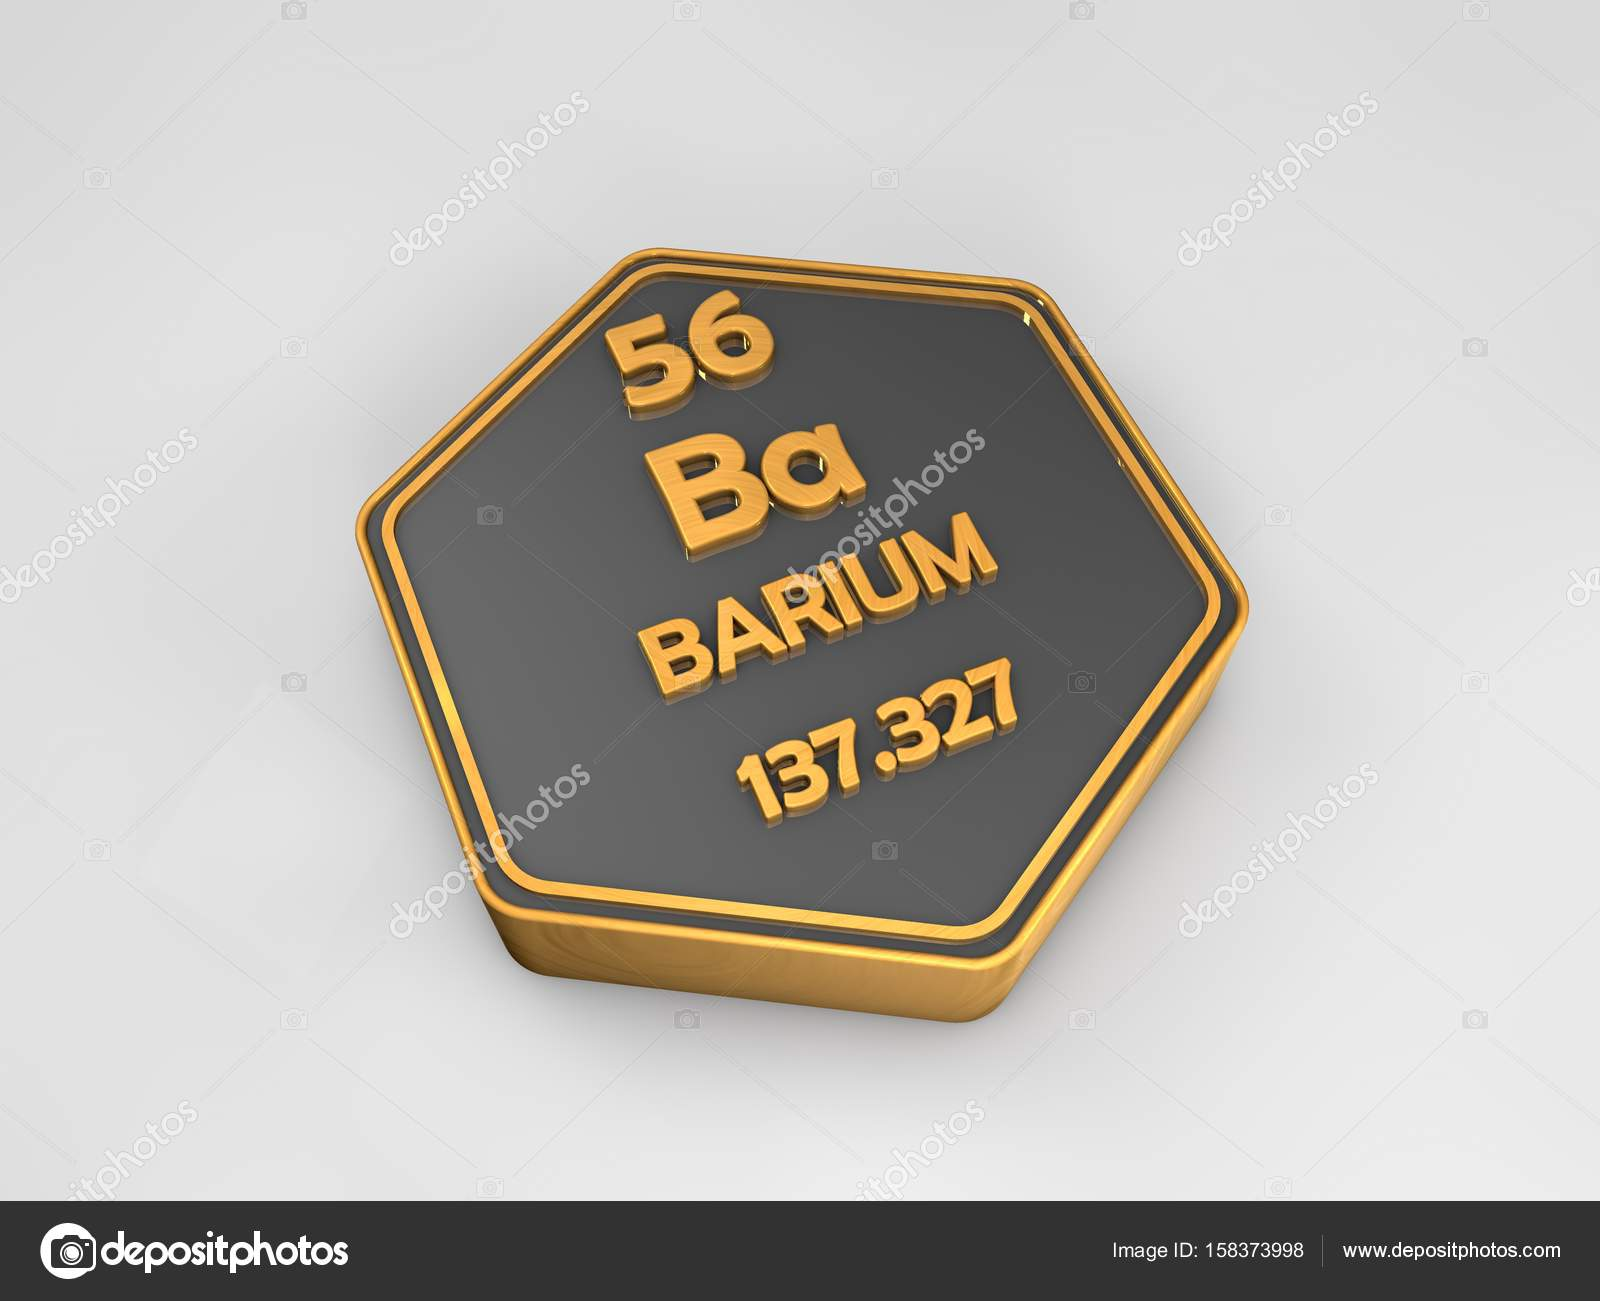 Barium ba chemical element periodic table hexagonal shape 3d barium ba chemical element periodic table hexagonal shape 3d render photo by viking75 biocorpaavc Images